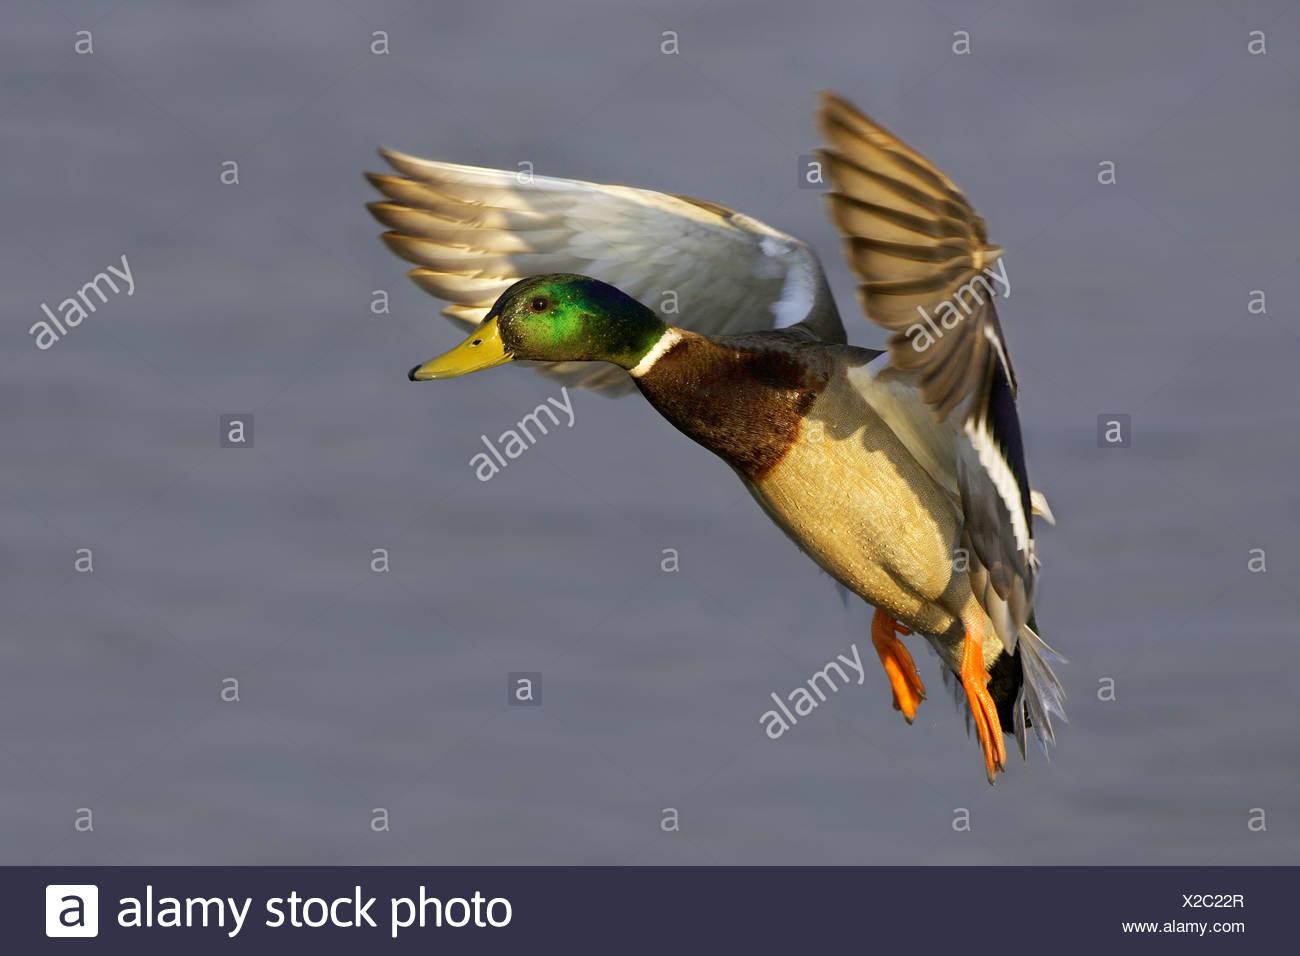 STOCKENTE (Anas Platyrhynchos) im Flug über Wasser. Lodmoor. Weymouth. Dorset. England Stockfoto